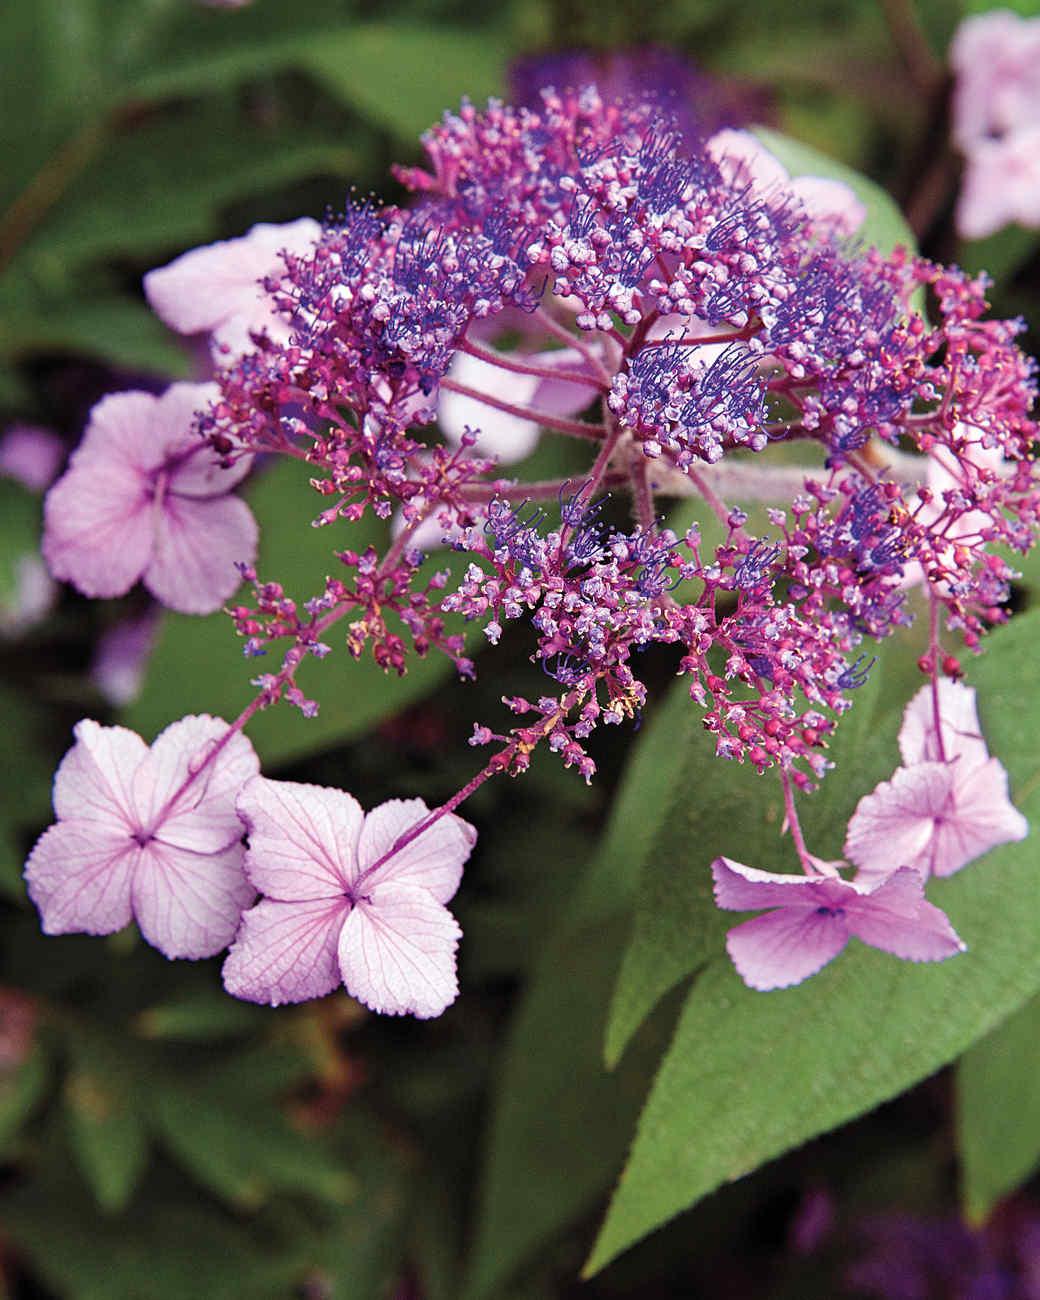 heckler-hydrangea-garden-522186aj-dsc6223-s111010.jpg